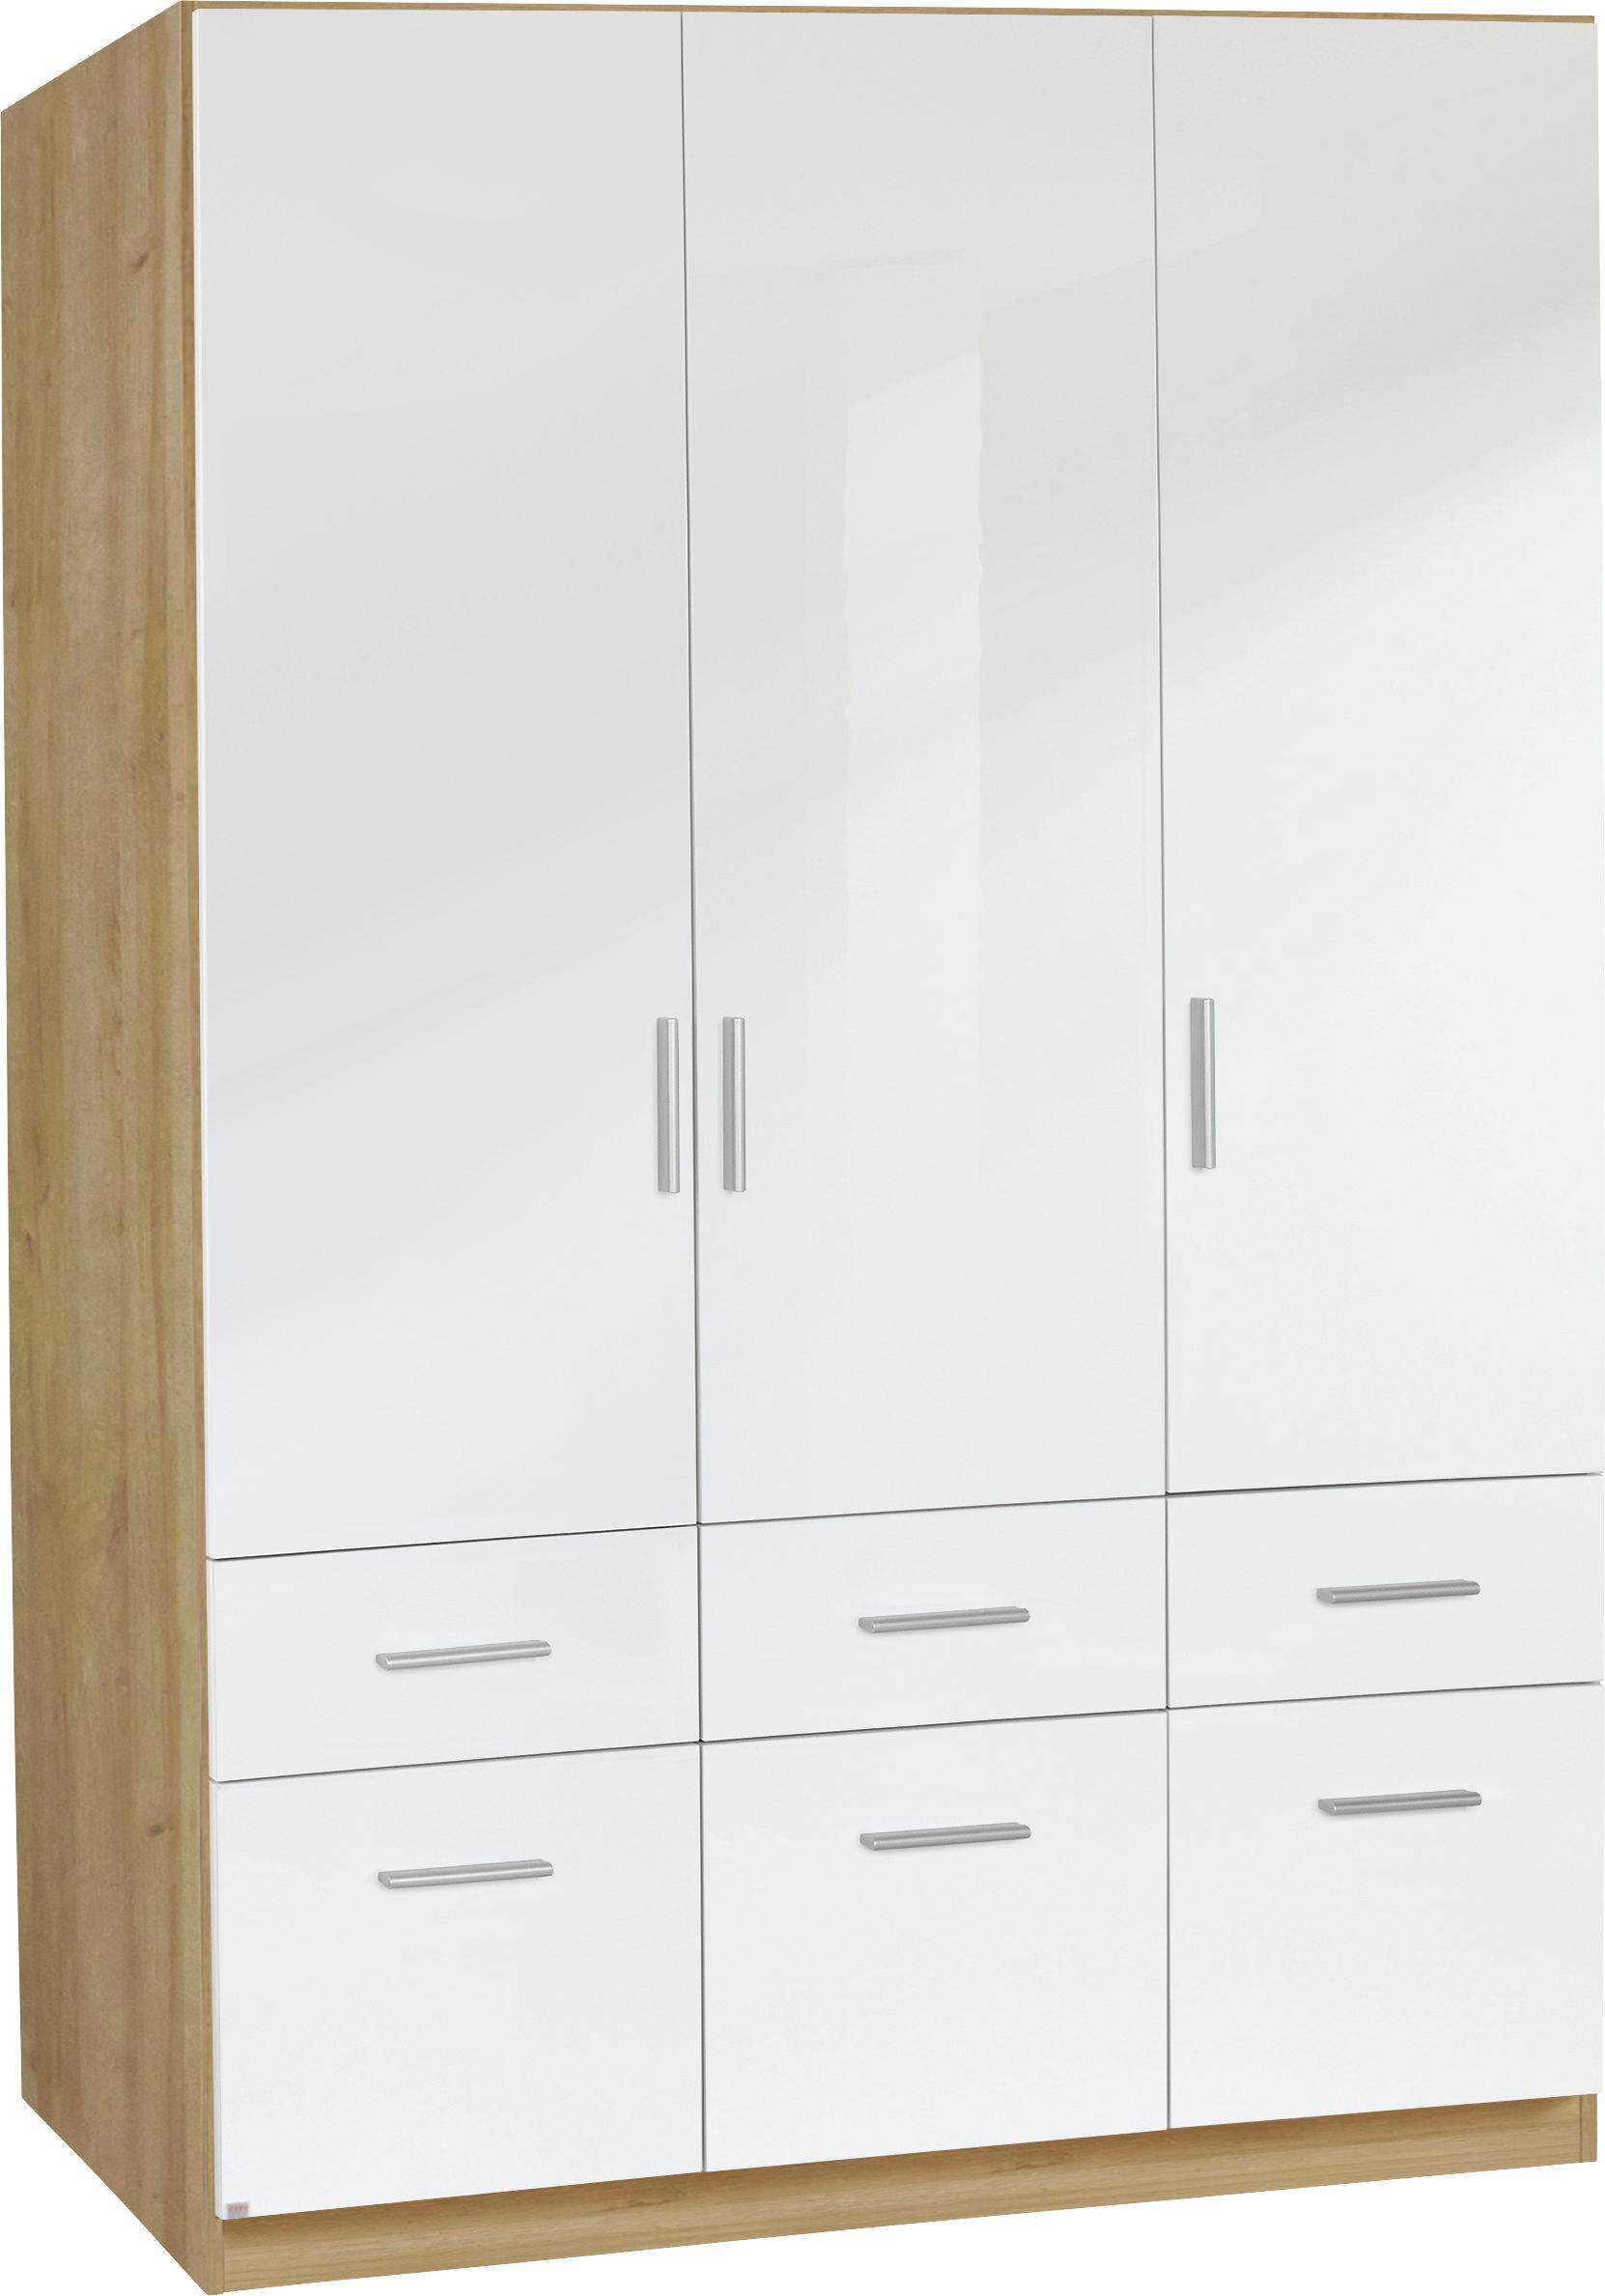 Charmant Schrank Holz Galerie Hauptinnenideen kakados